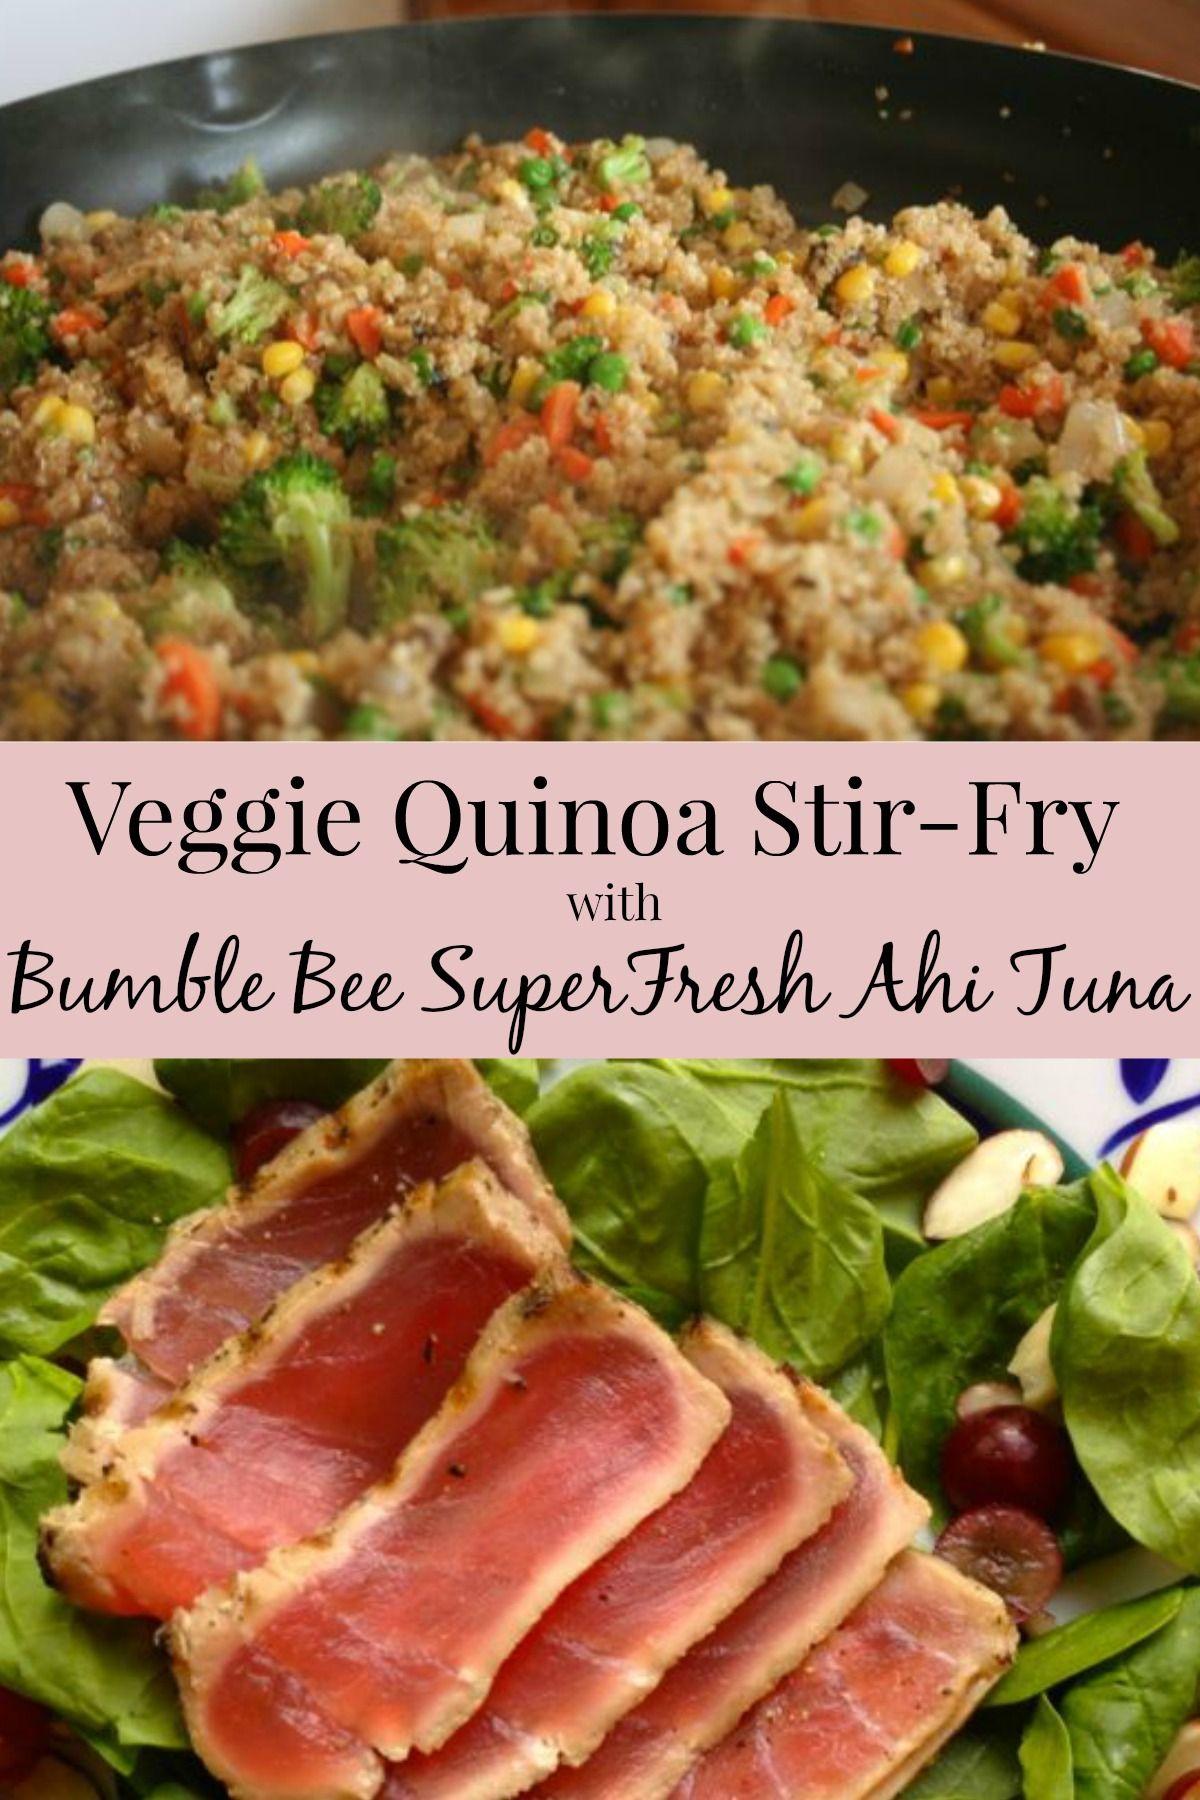 Instead of fried rice, I made a veggie quinoa stir-fry to pair with Bumble Bee SuperFresh Seared Ahi Tuna® (ad) #BBSuperFresh #SeaFoodies